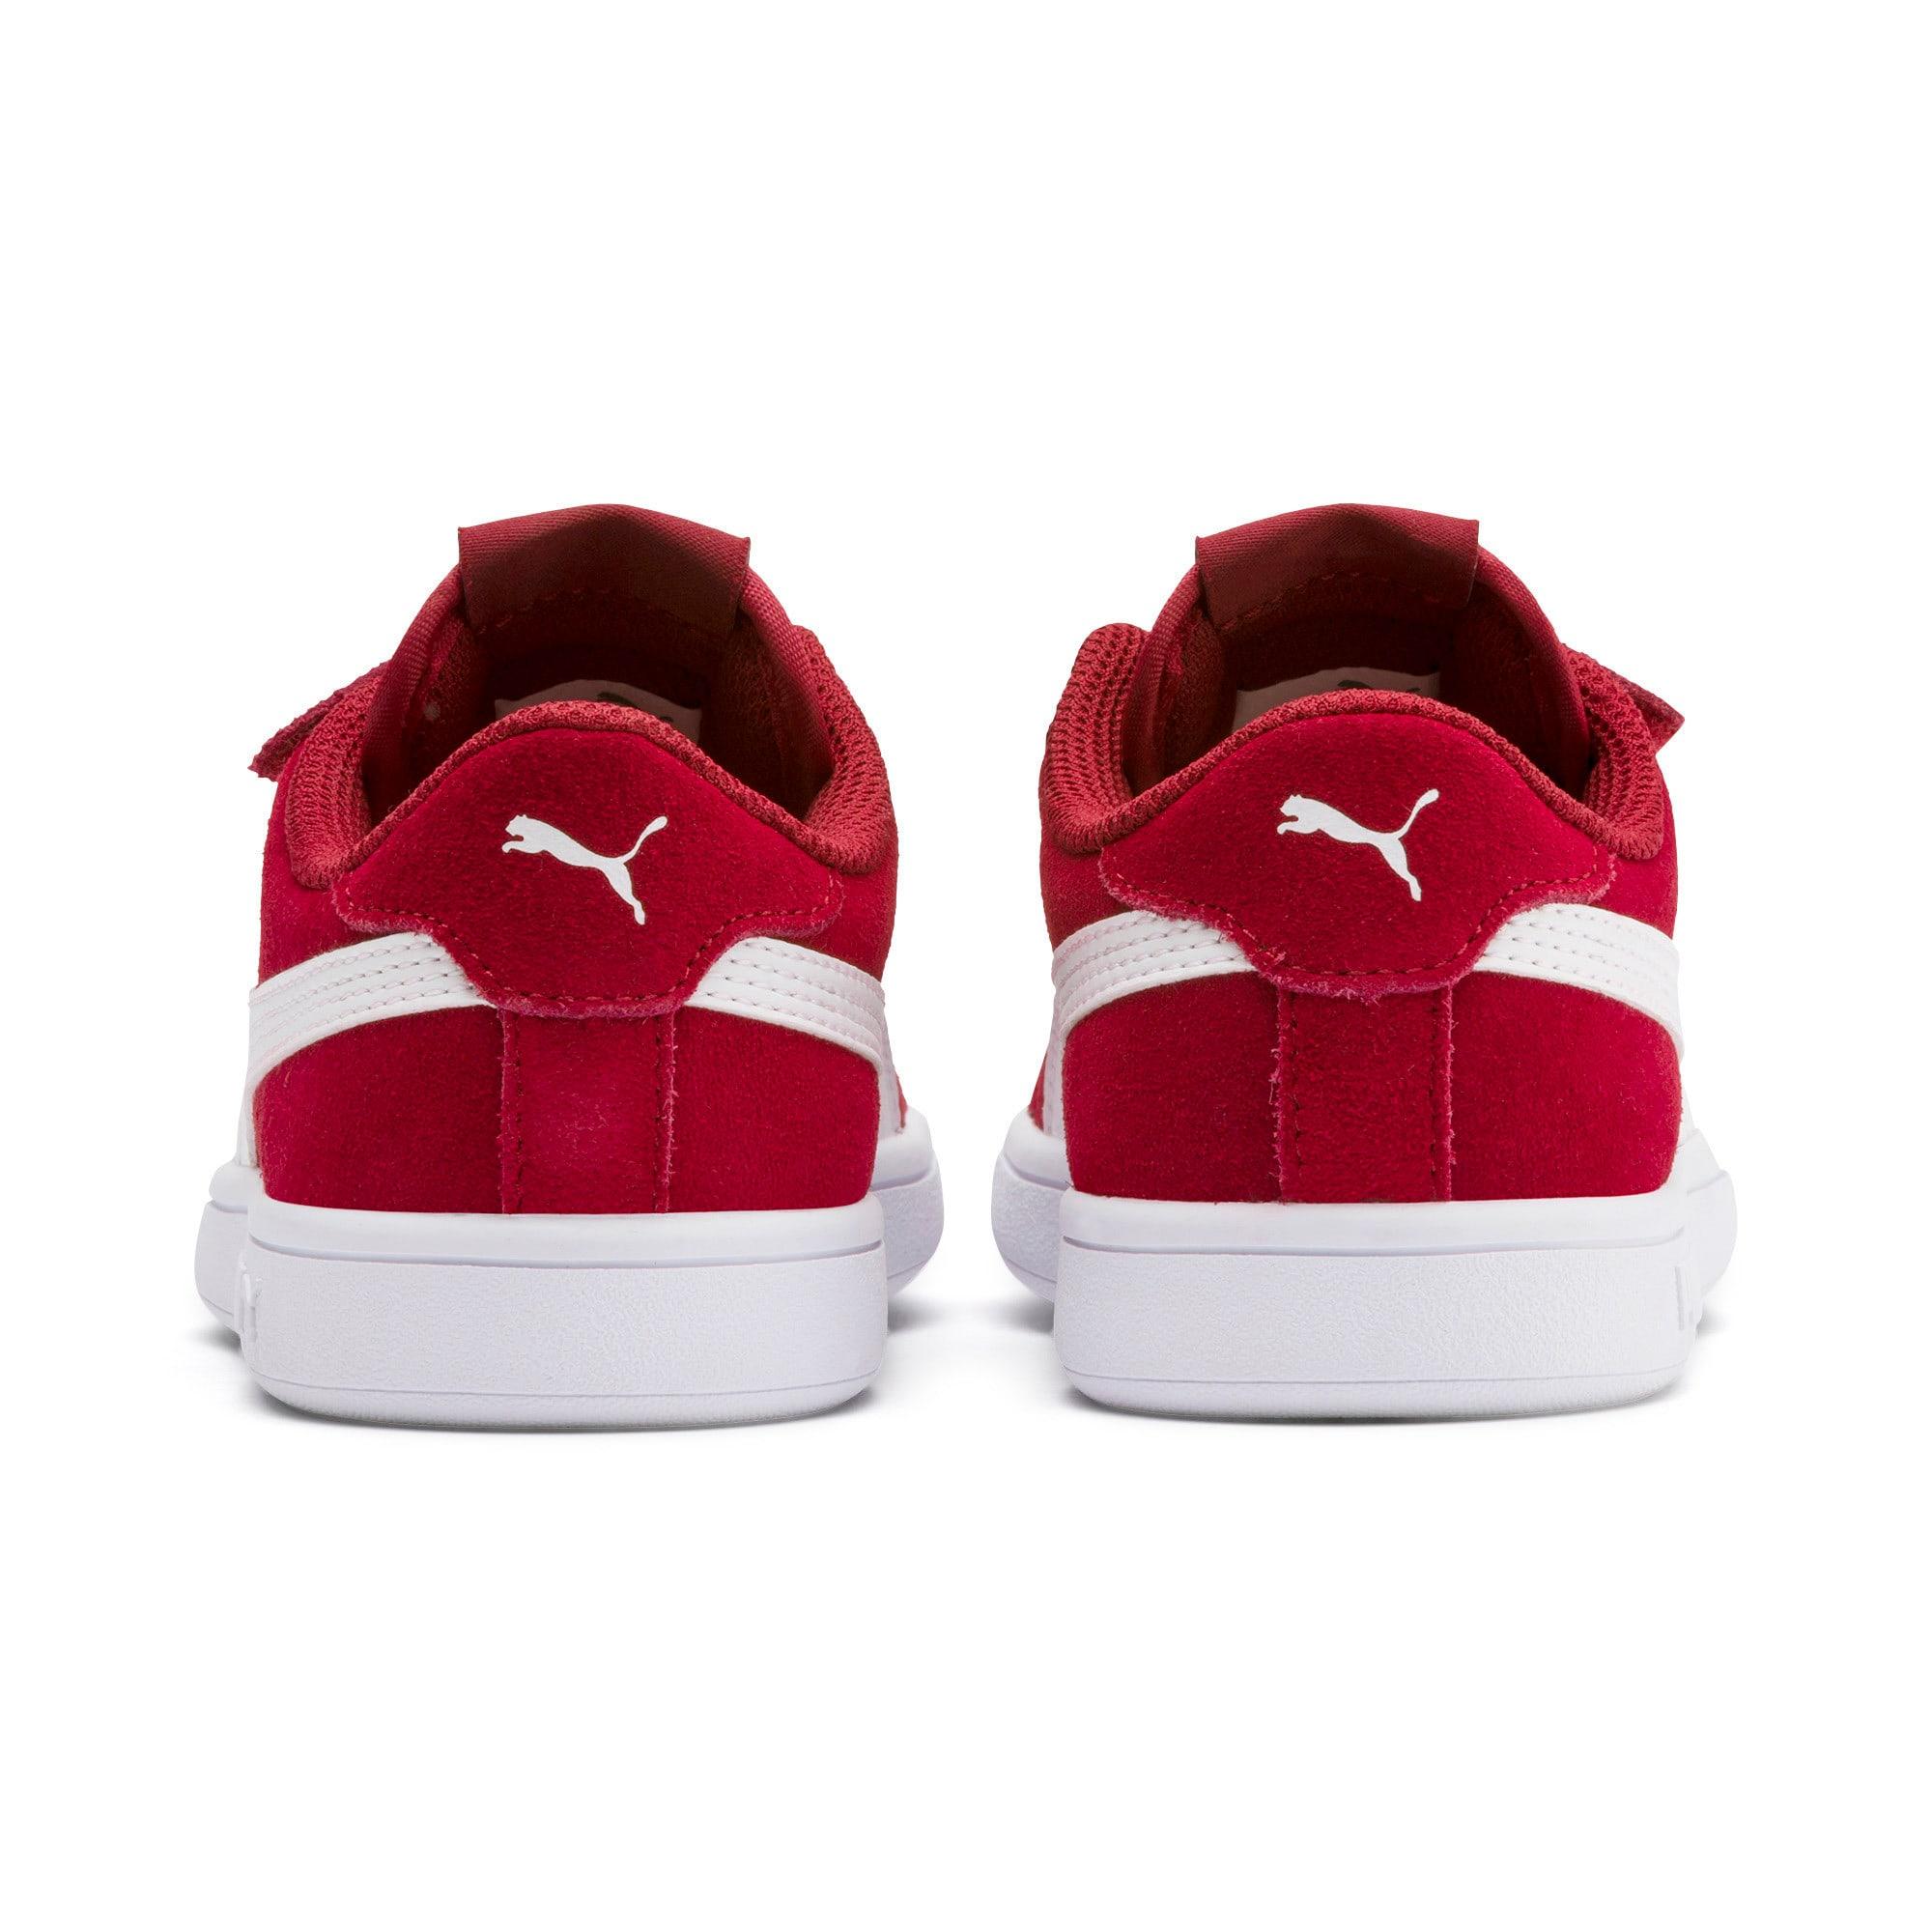 Thumbnail 3 of Smash v2 Suede Little Kids' Shoes, Rhubarb-Puma White, medium